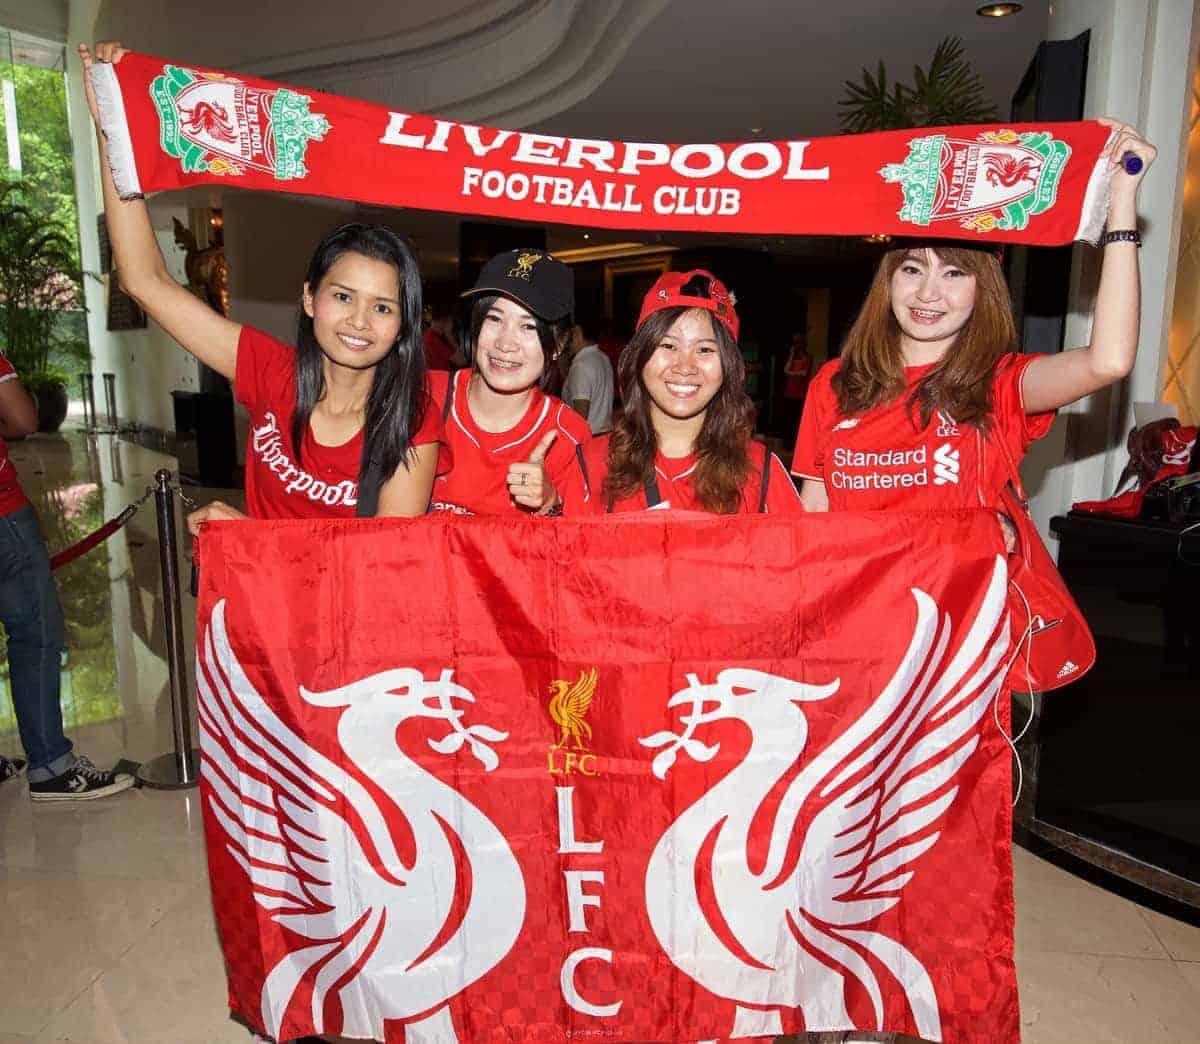 Football - Liverpool FC Preseason Tour 2015 - Day 1